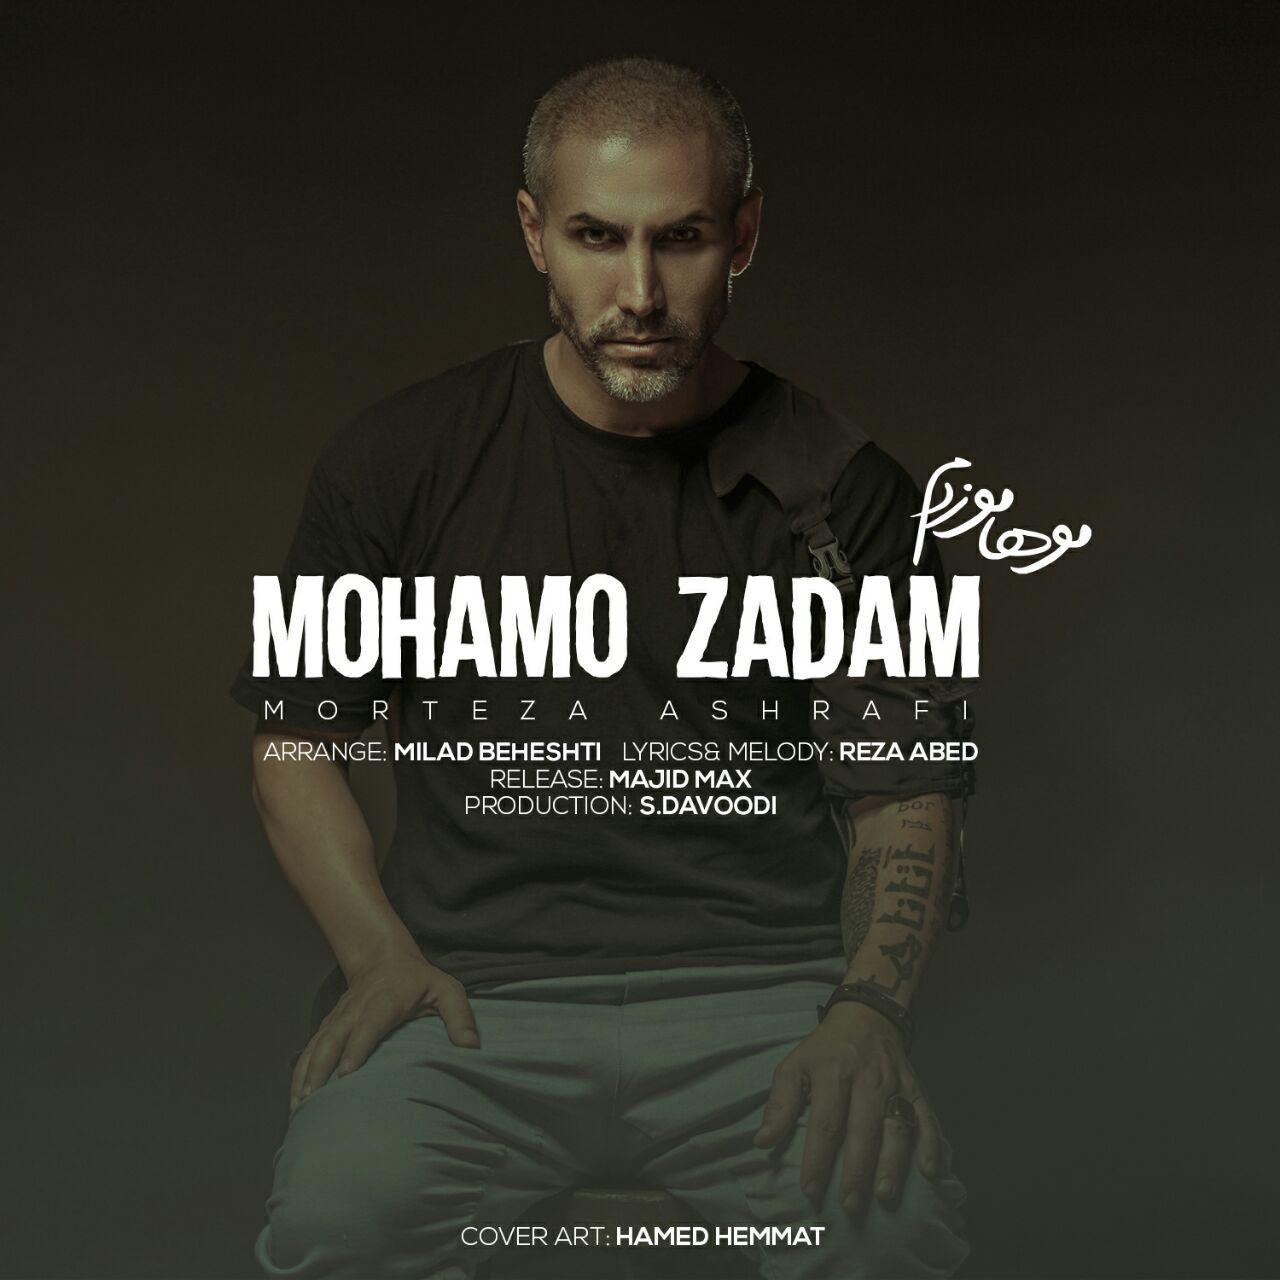 Morteza Ashrafi – Mohamo Zadam